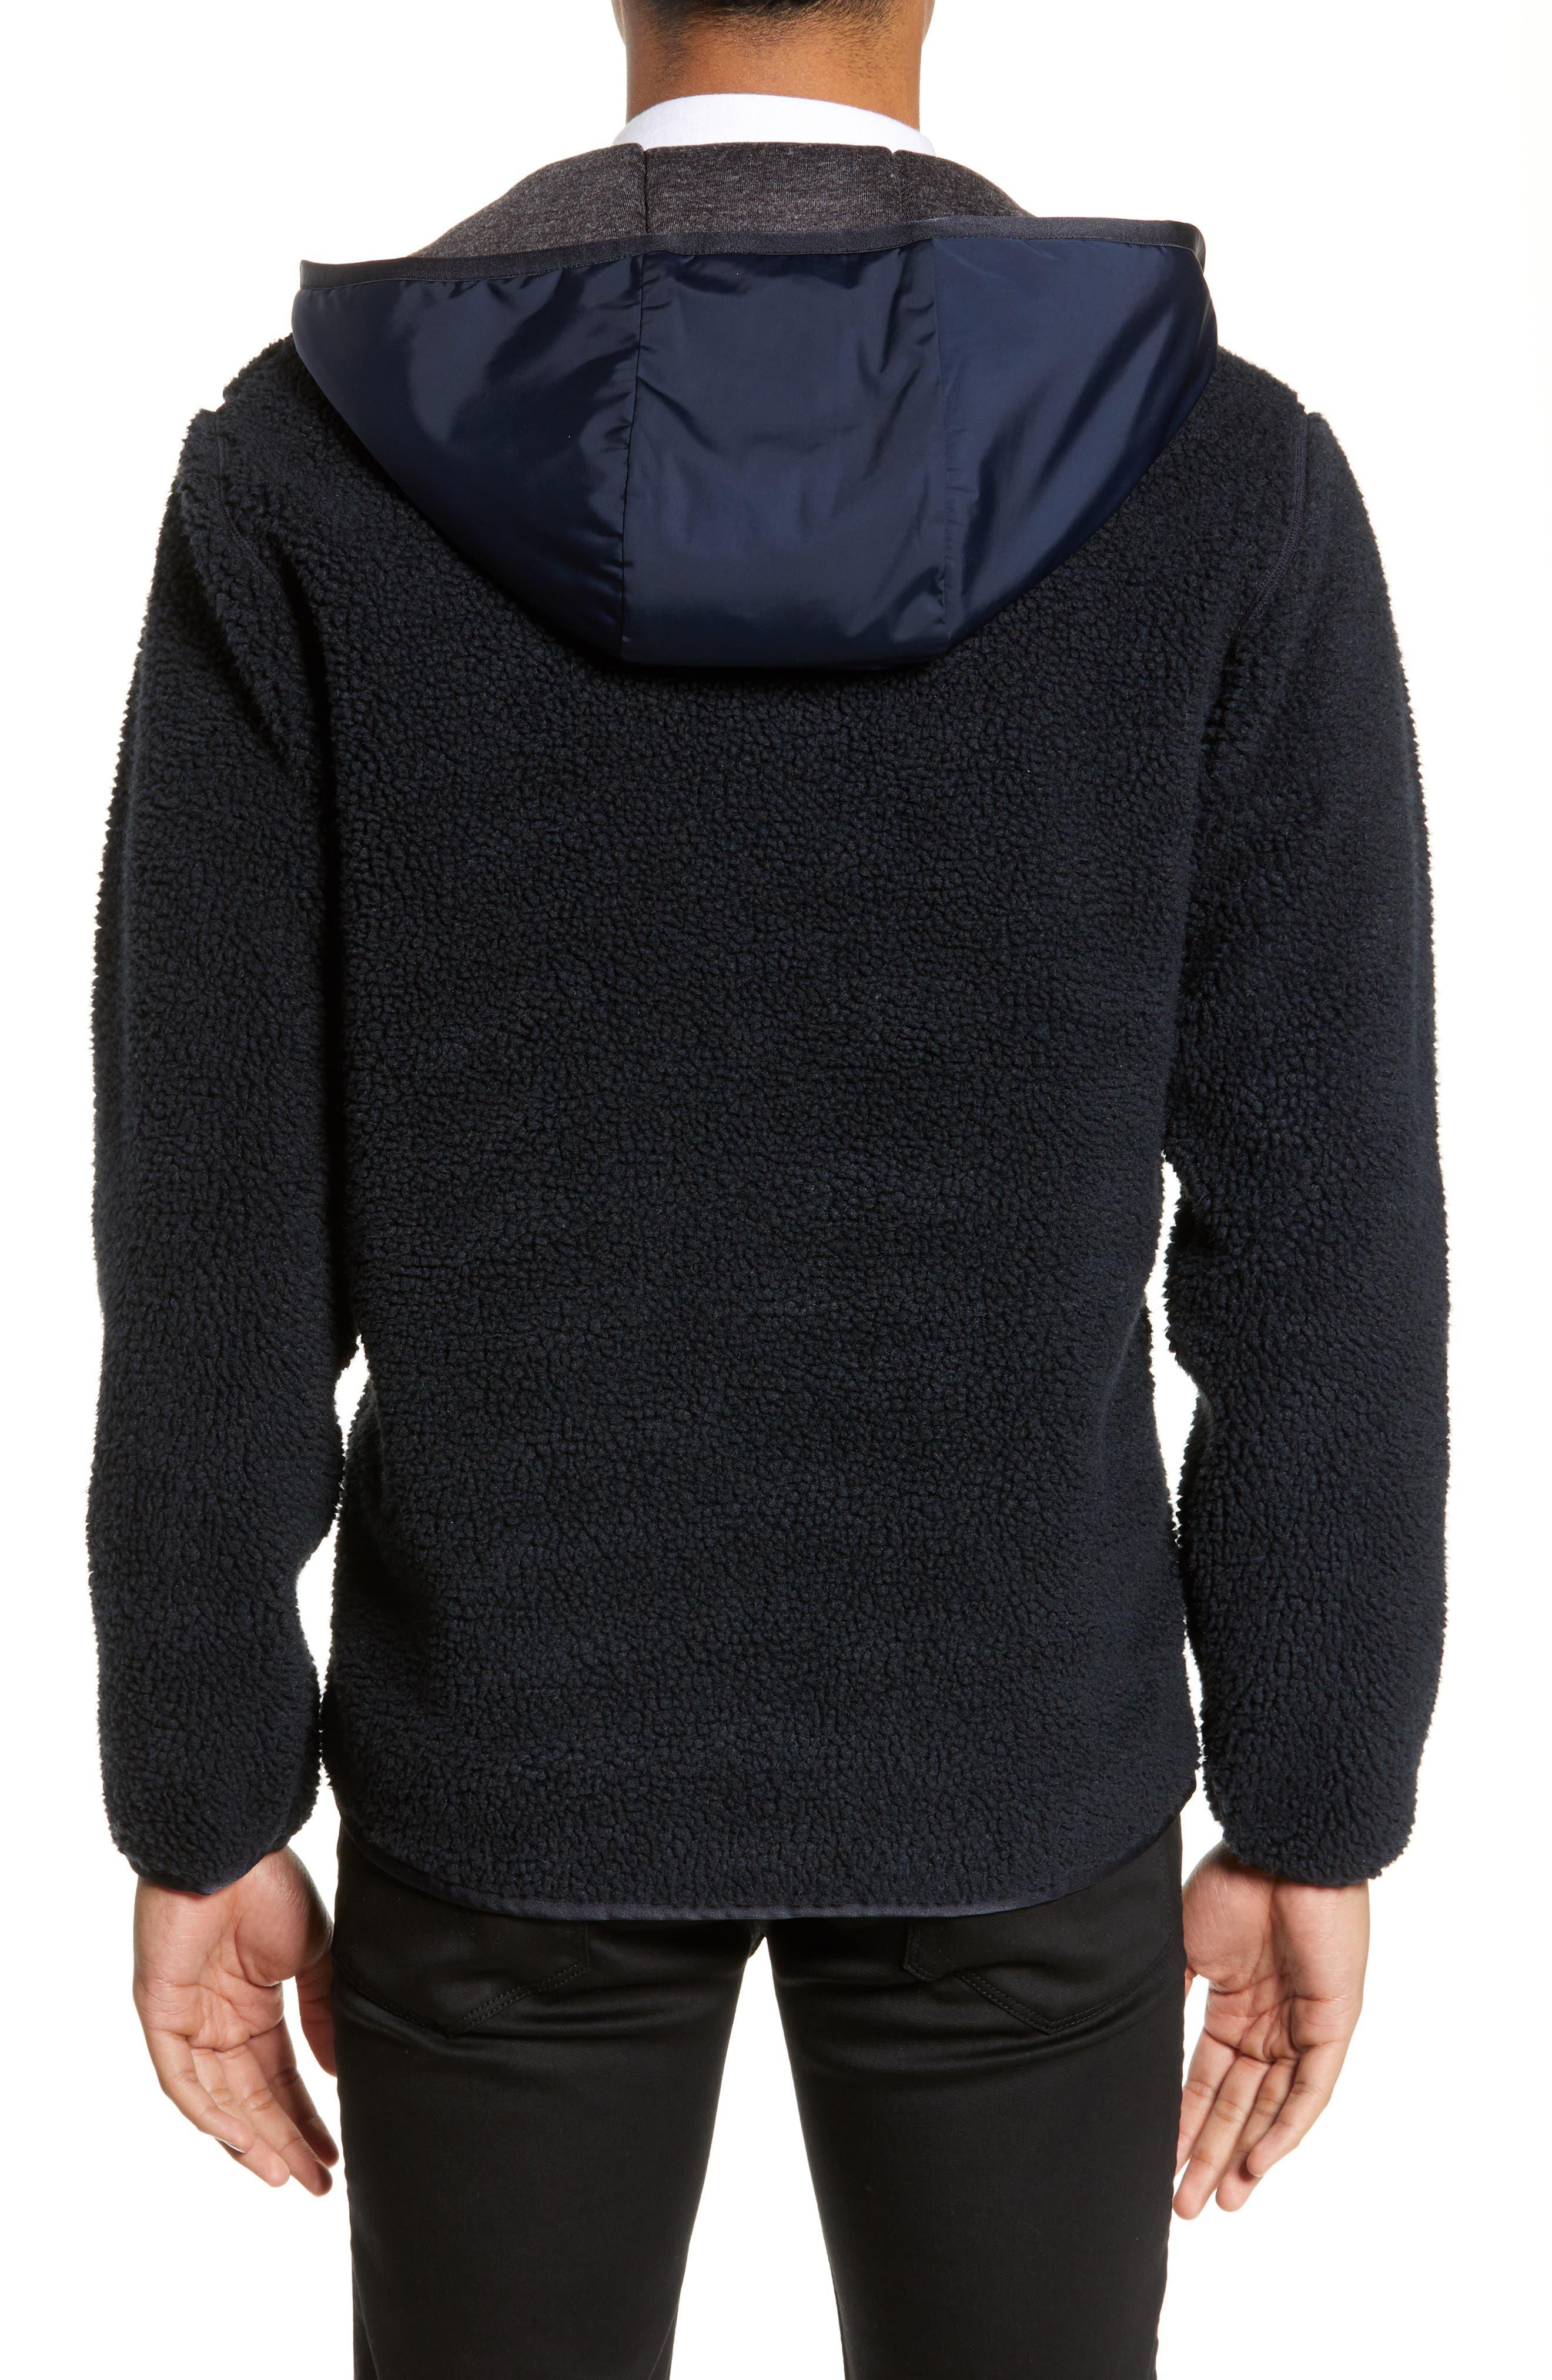 THEORY,                             Polar Fleece Reversible Zip Hoodie,                             Alternate thumbnail 3, color,                             ECLIPSE/ ASHPALT MELANGE